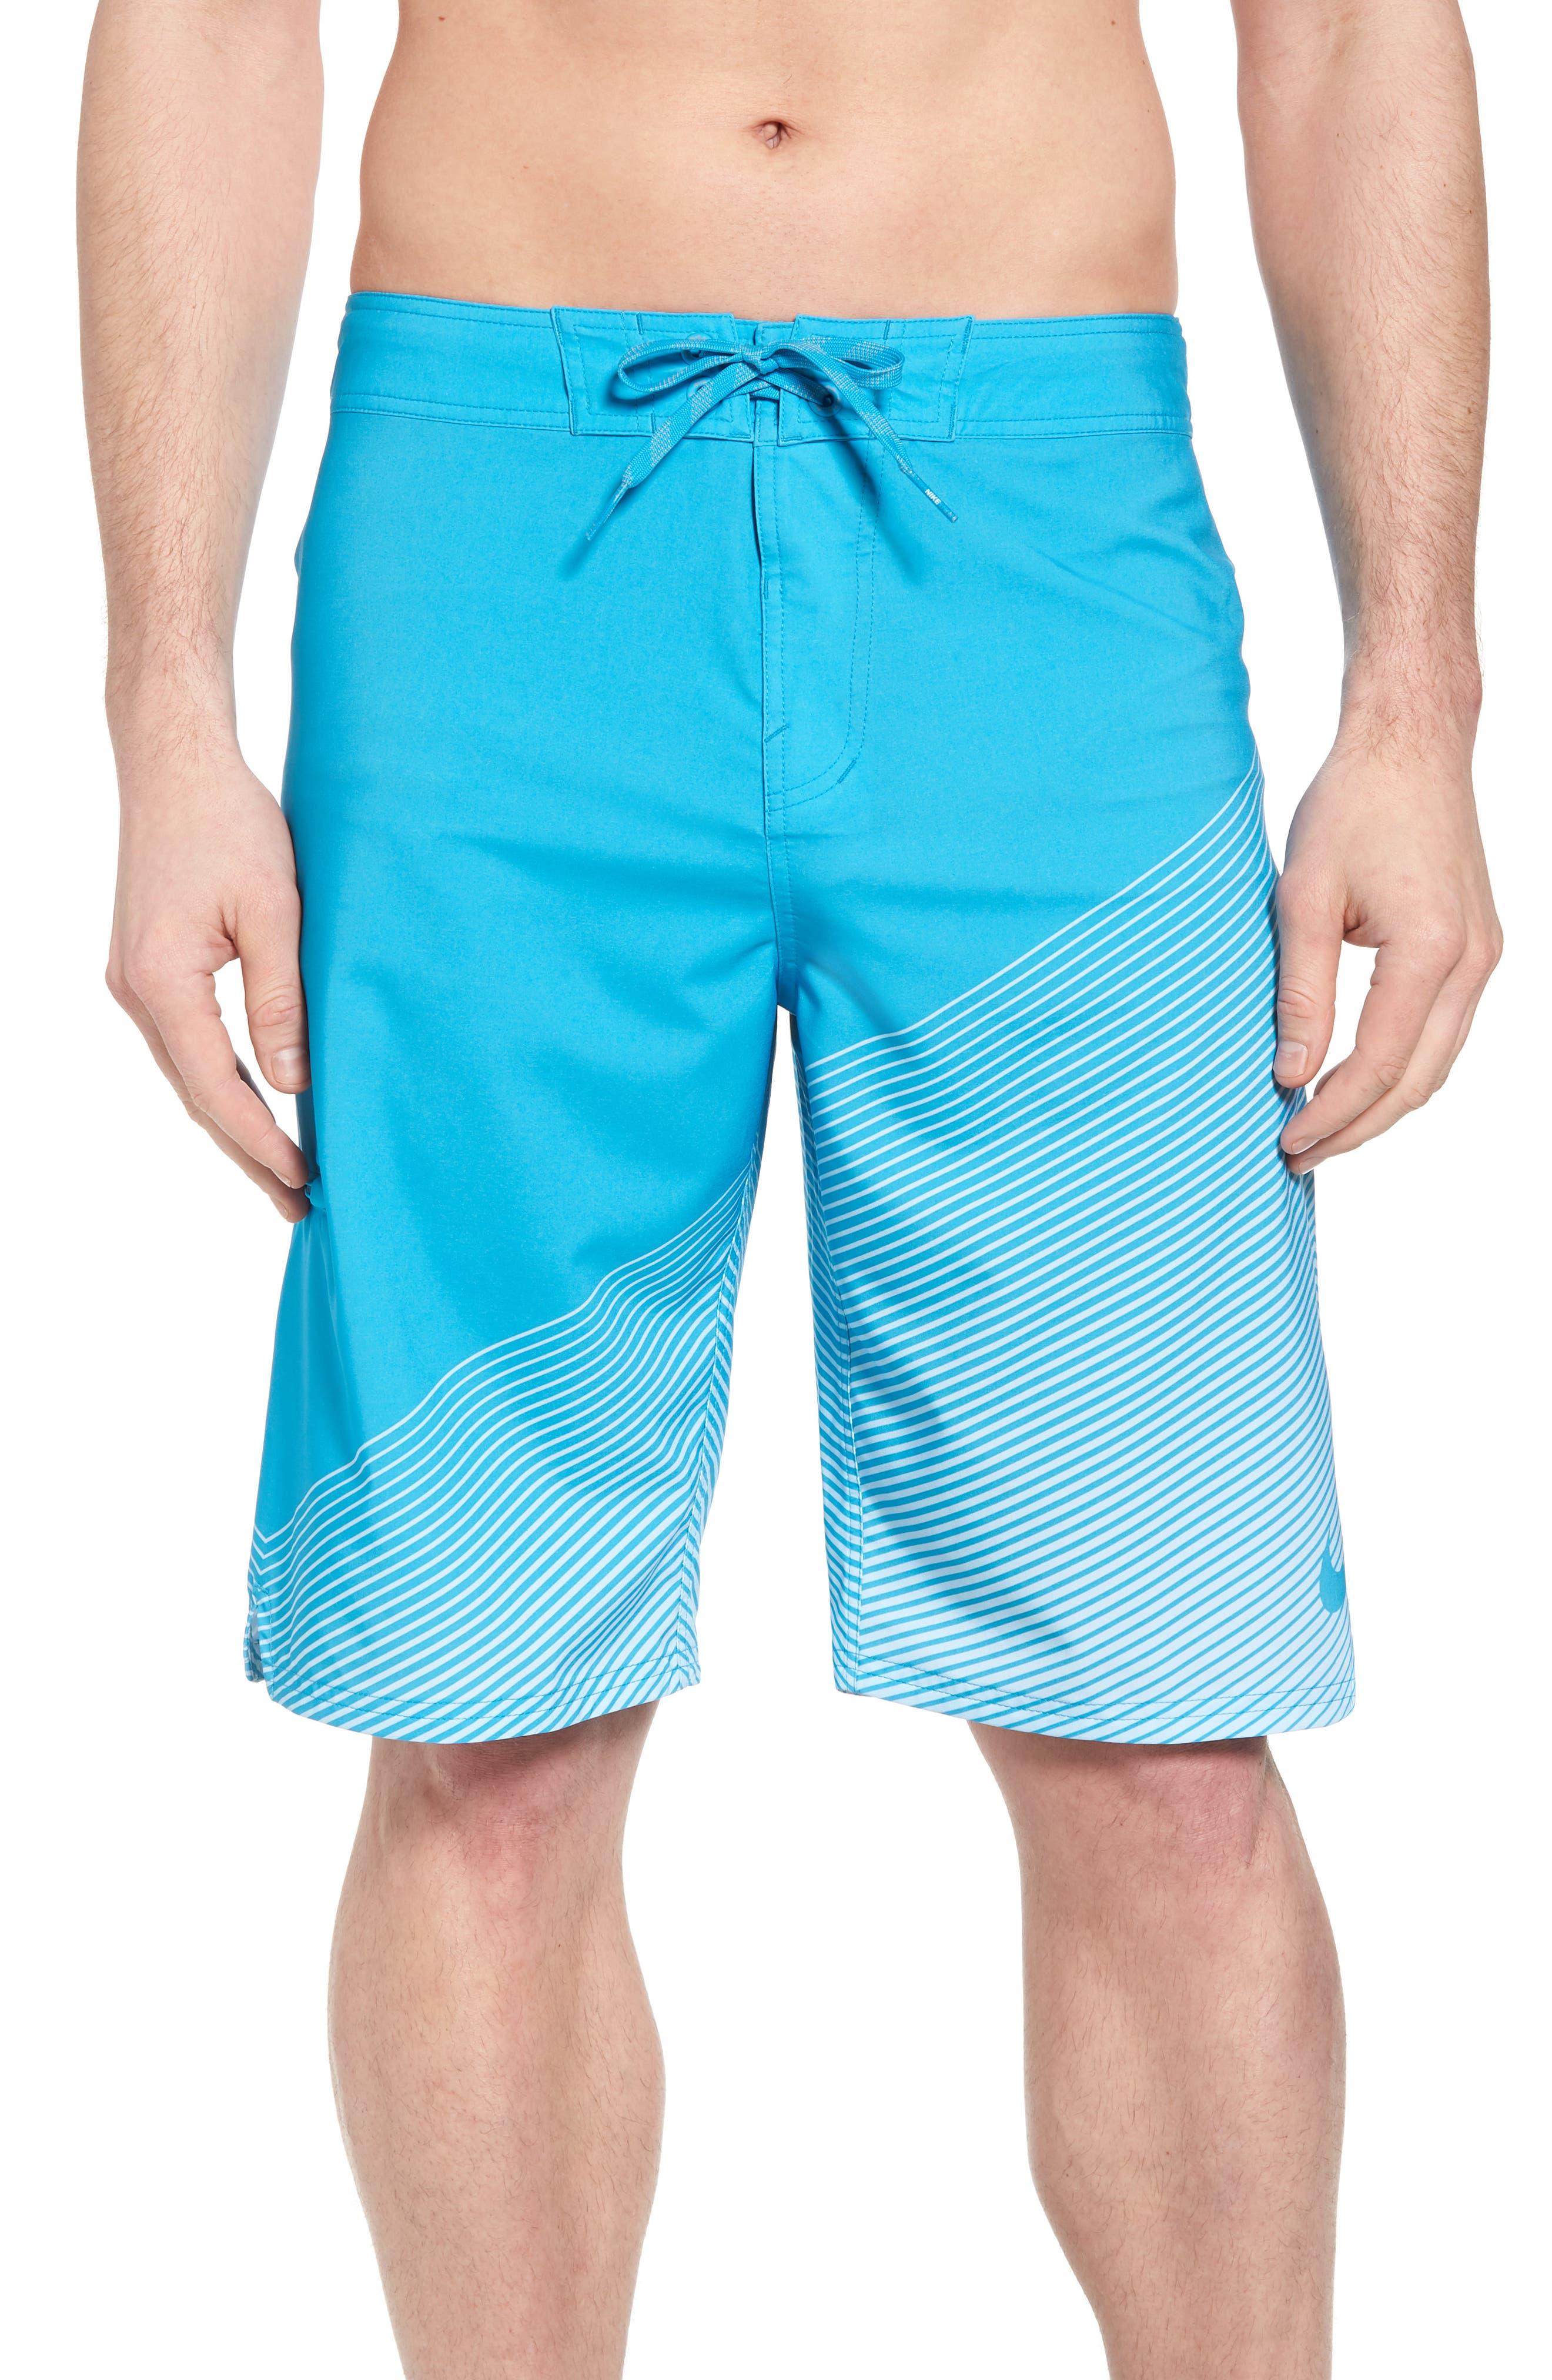 Jackknife Board Shorts,                             Main thumbnail 1, color,                             Lt Blue Fury